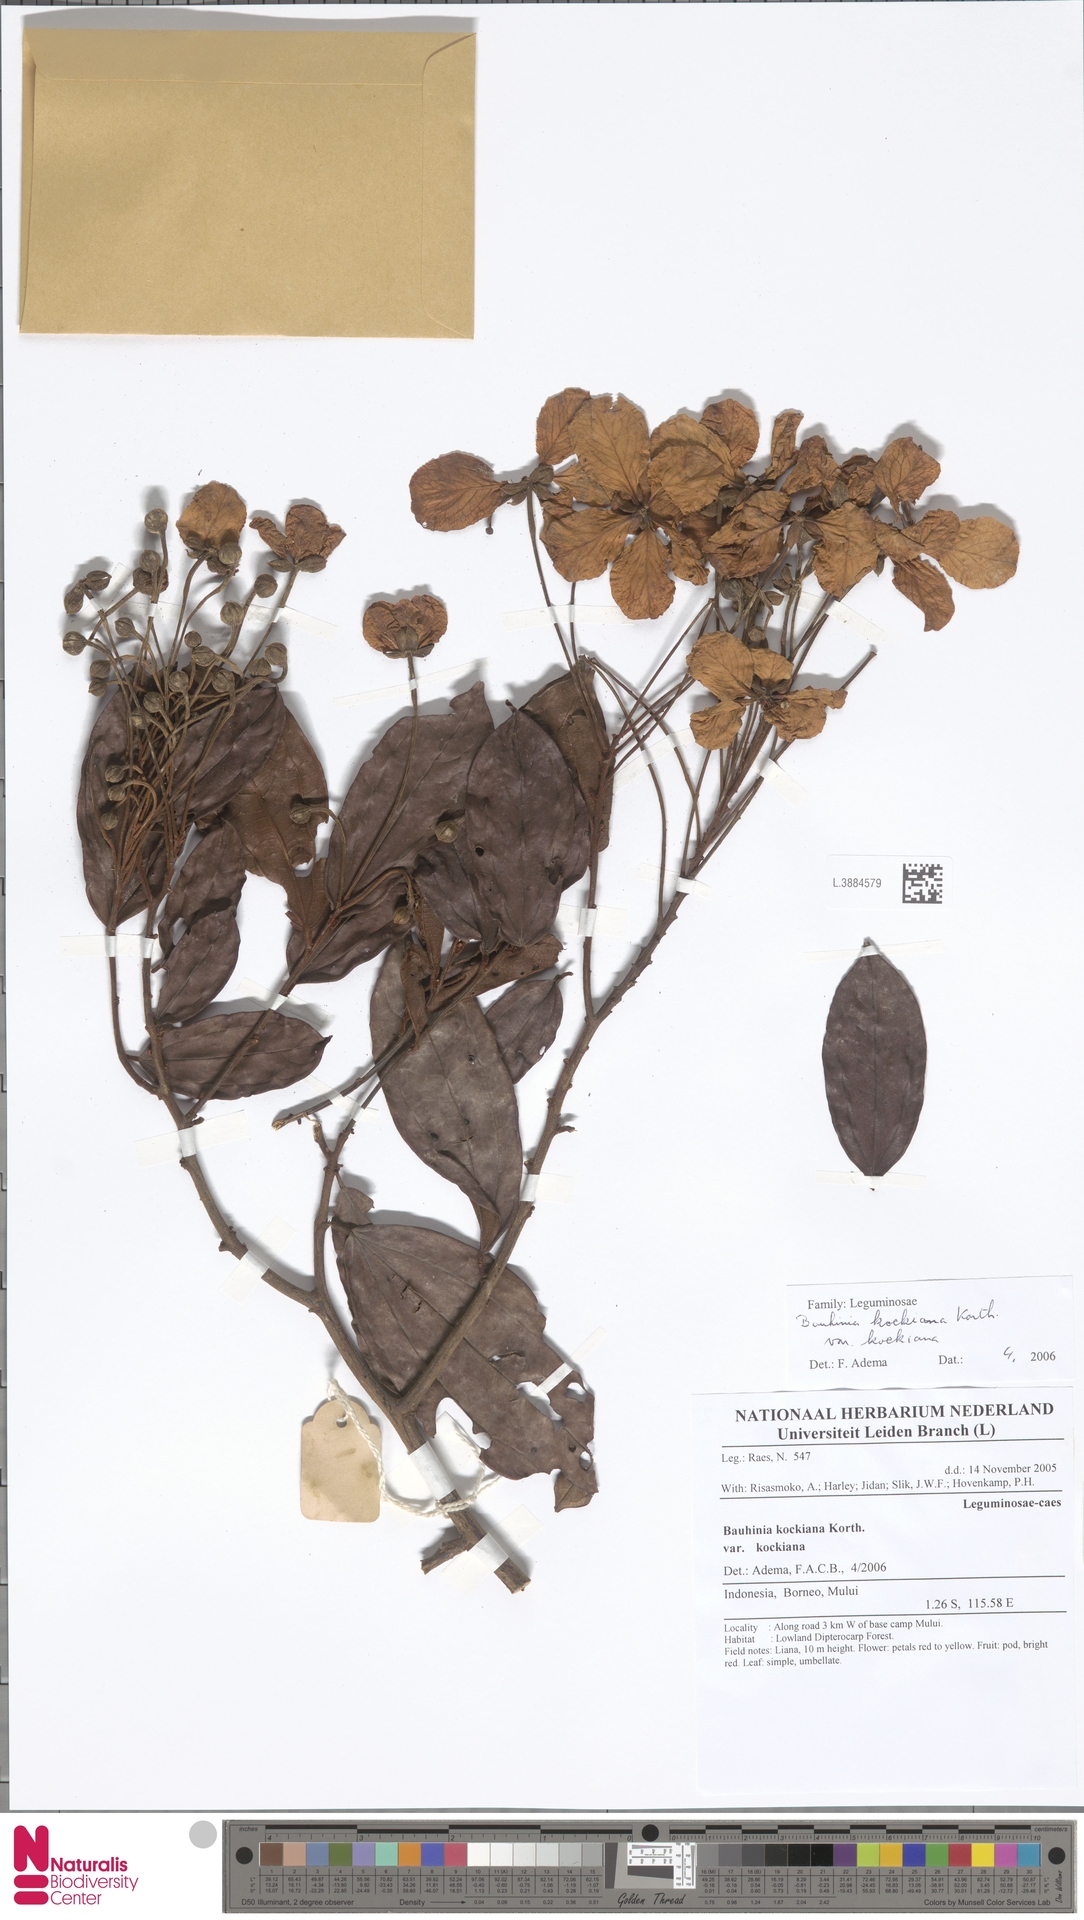 L.3884579 | Bauhinia kockiana var. kockiana